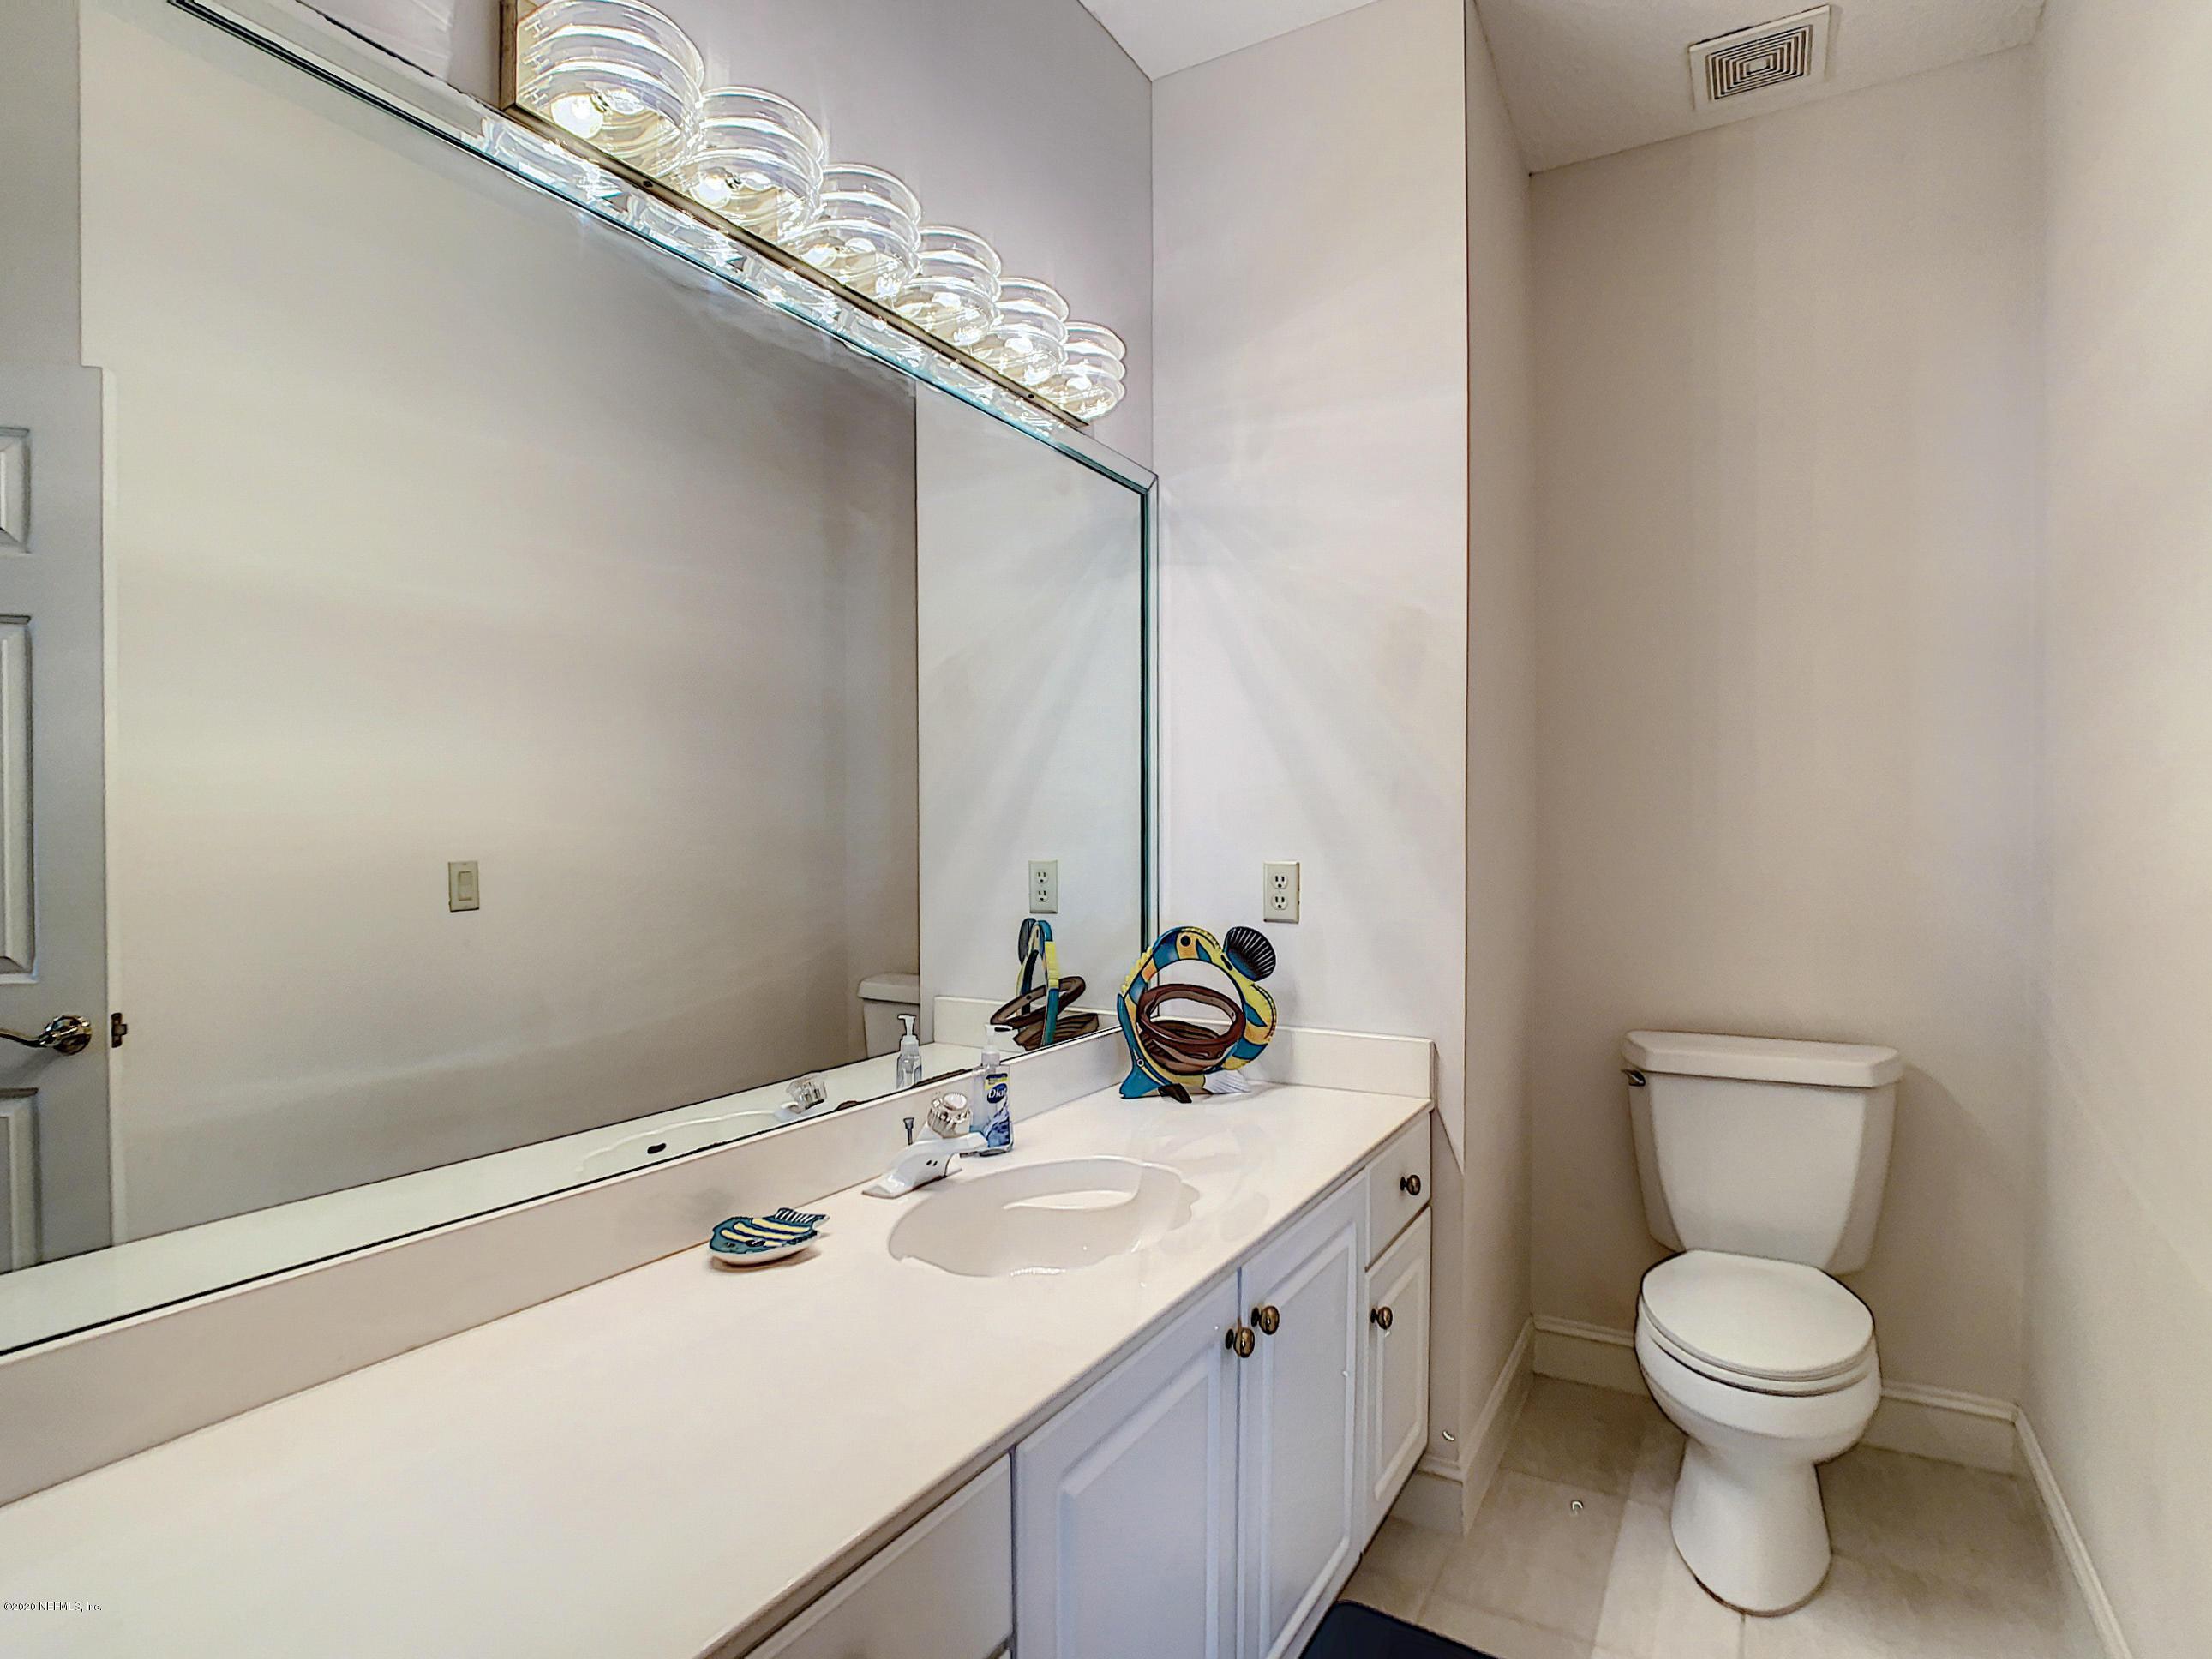 12881 BAY PLANTATION, JACKSONVILLE, FLORIDA 32223, 5 Bedrooms Bedrooms, ,5 BathroomsBathrooms,Residential,For sale,BAY PLANTATION,1014016